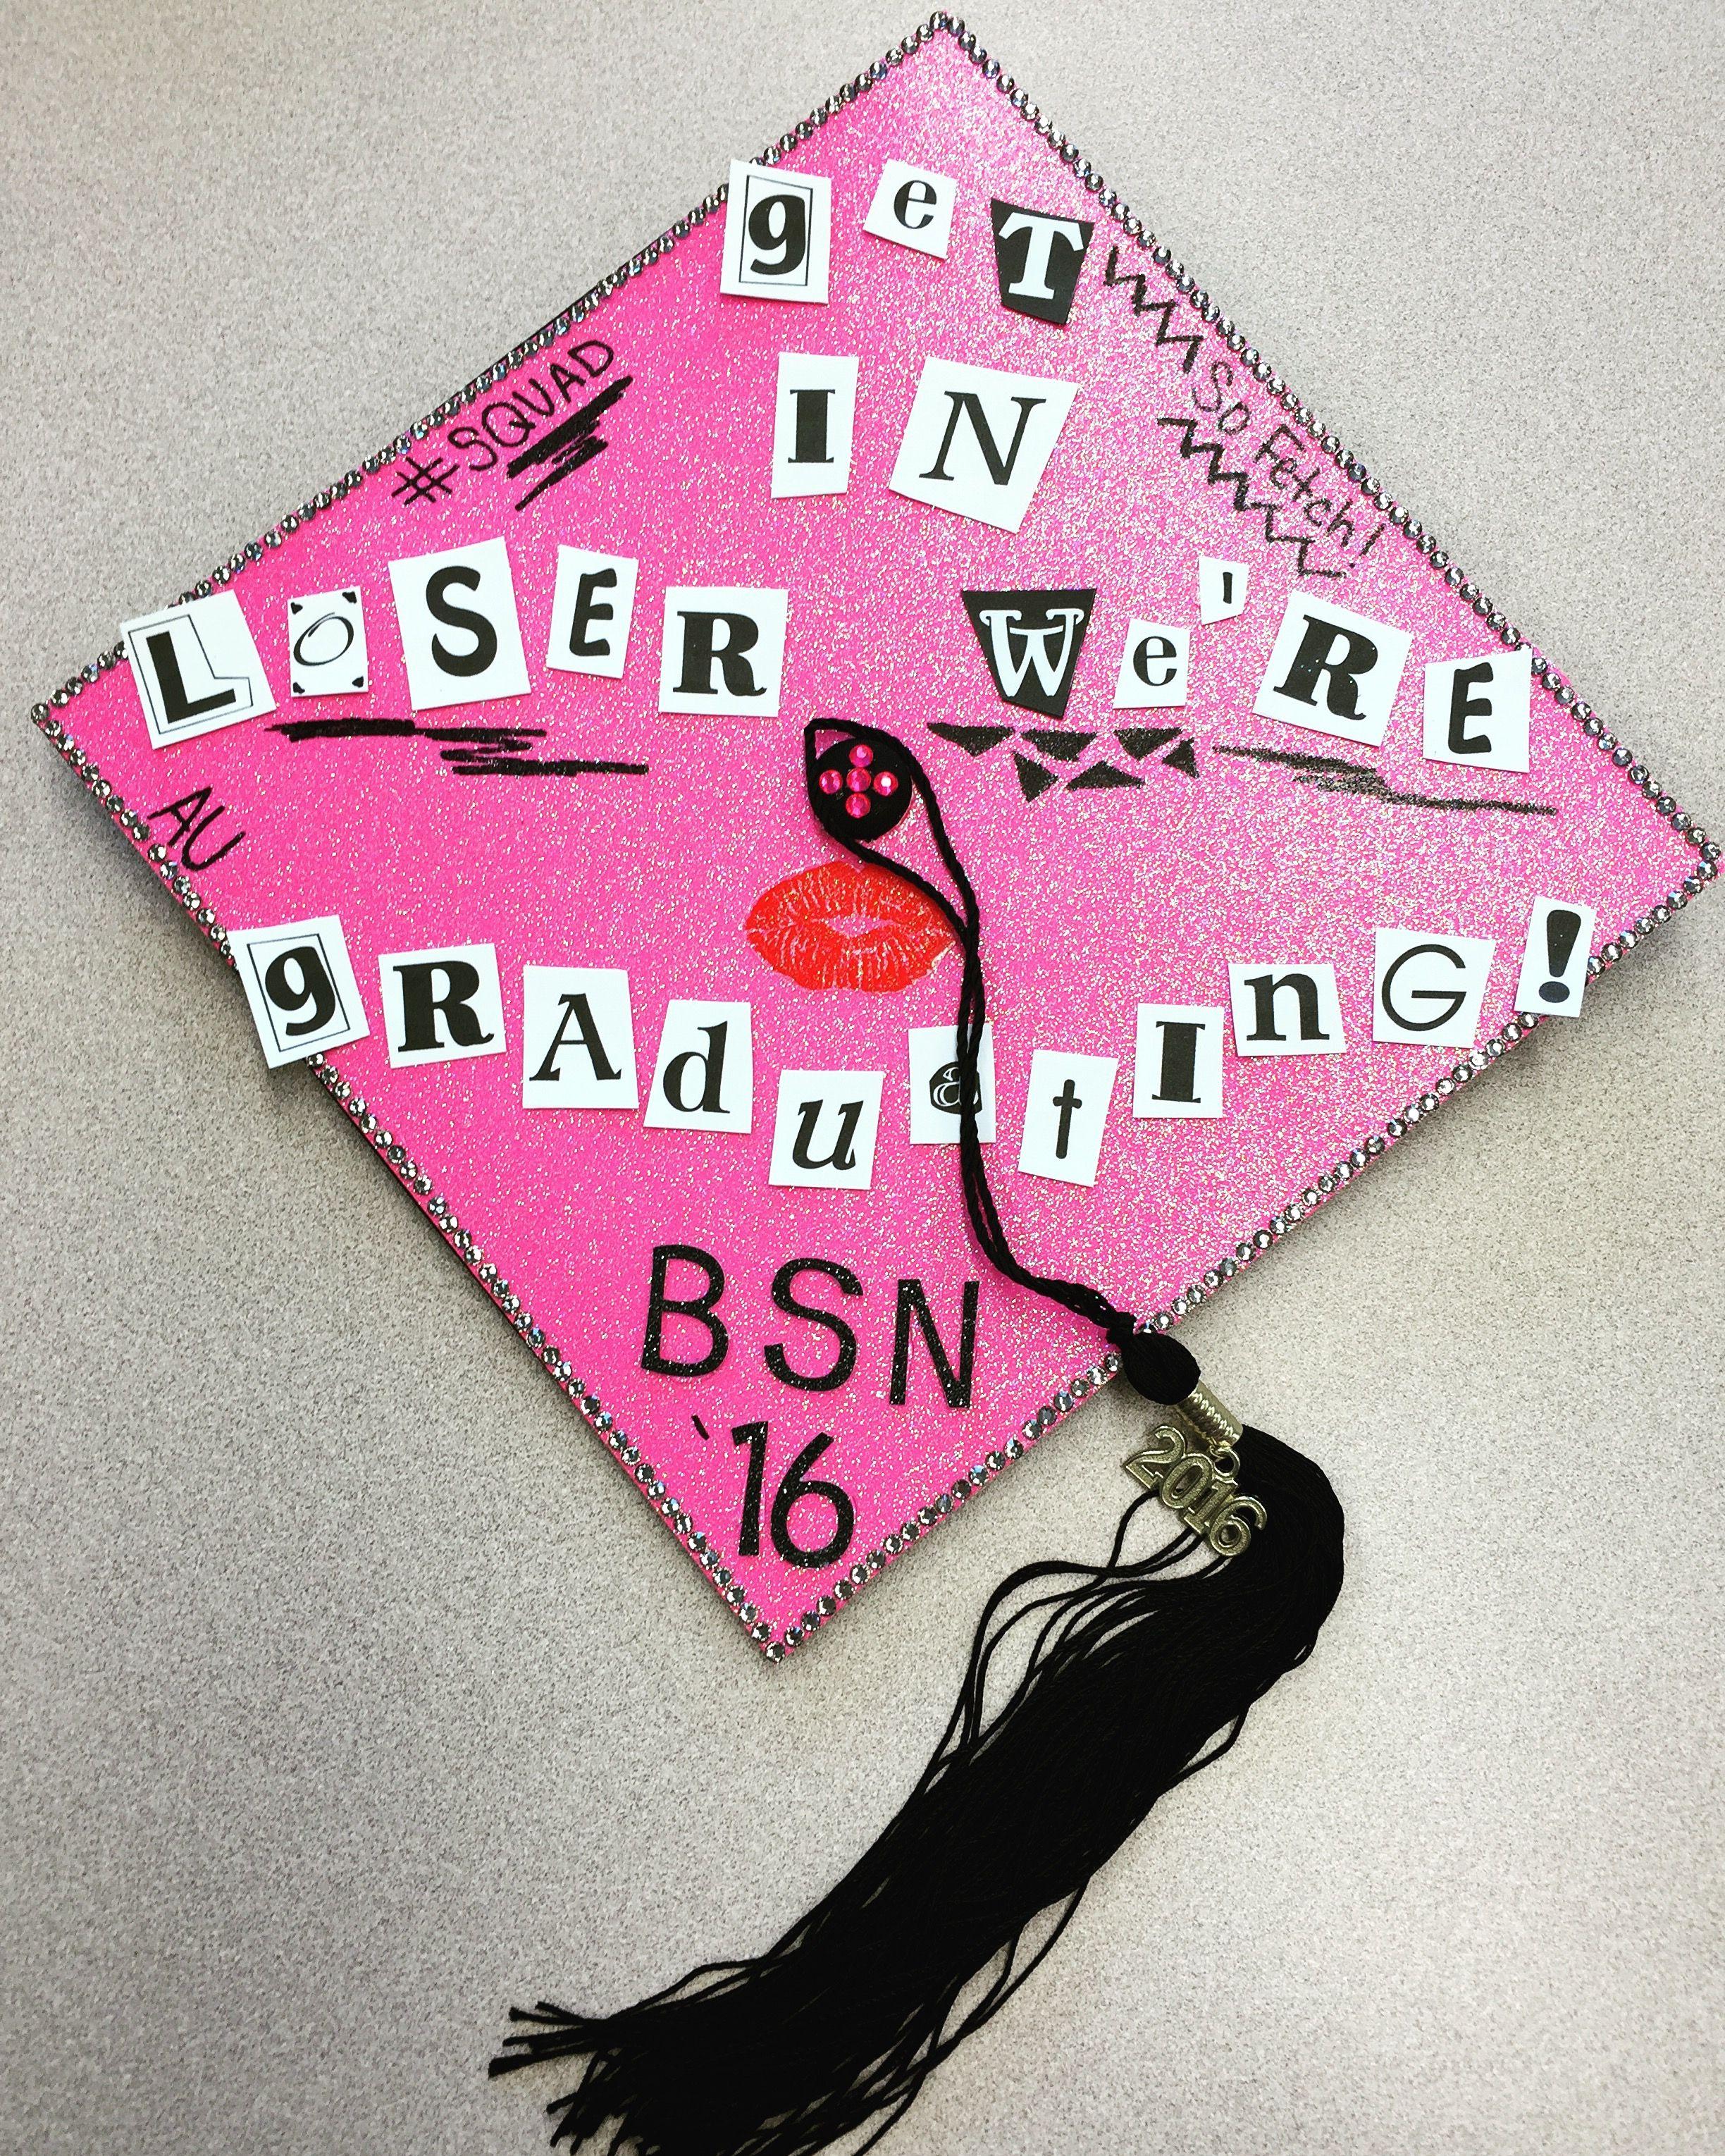 Decorating graduation cap ideas for teachers - Mean Girls Quotes Burn Book Nursing School Graduation Cap